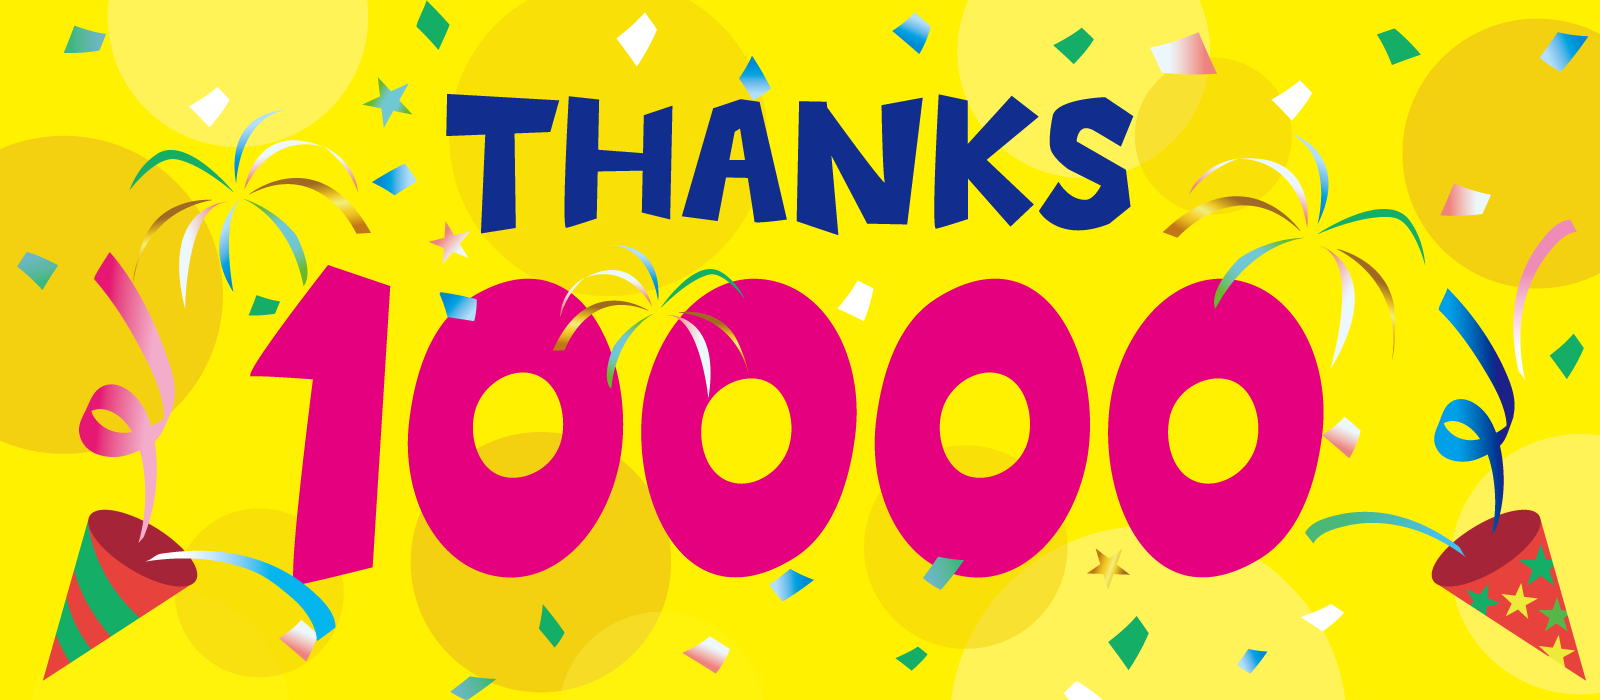 i000577_thanks_10000_yellow